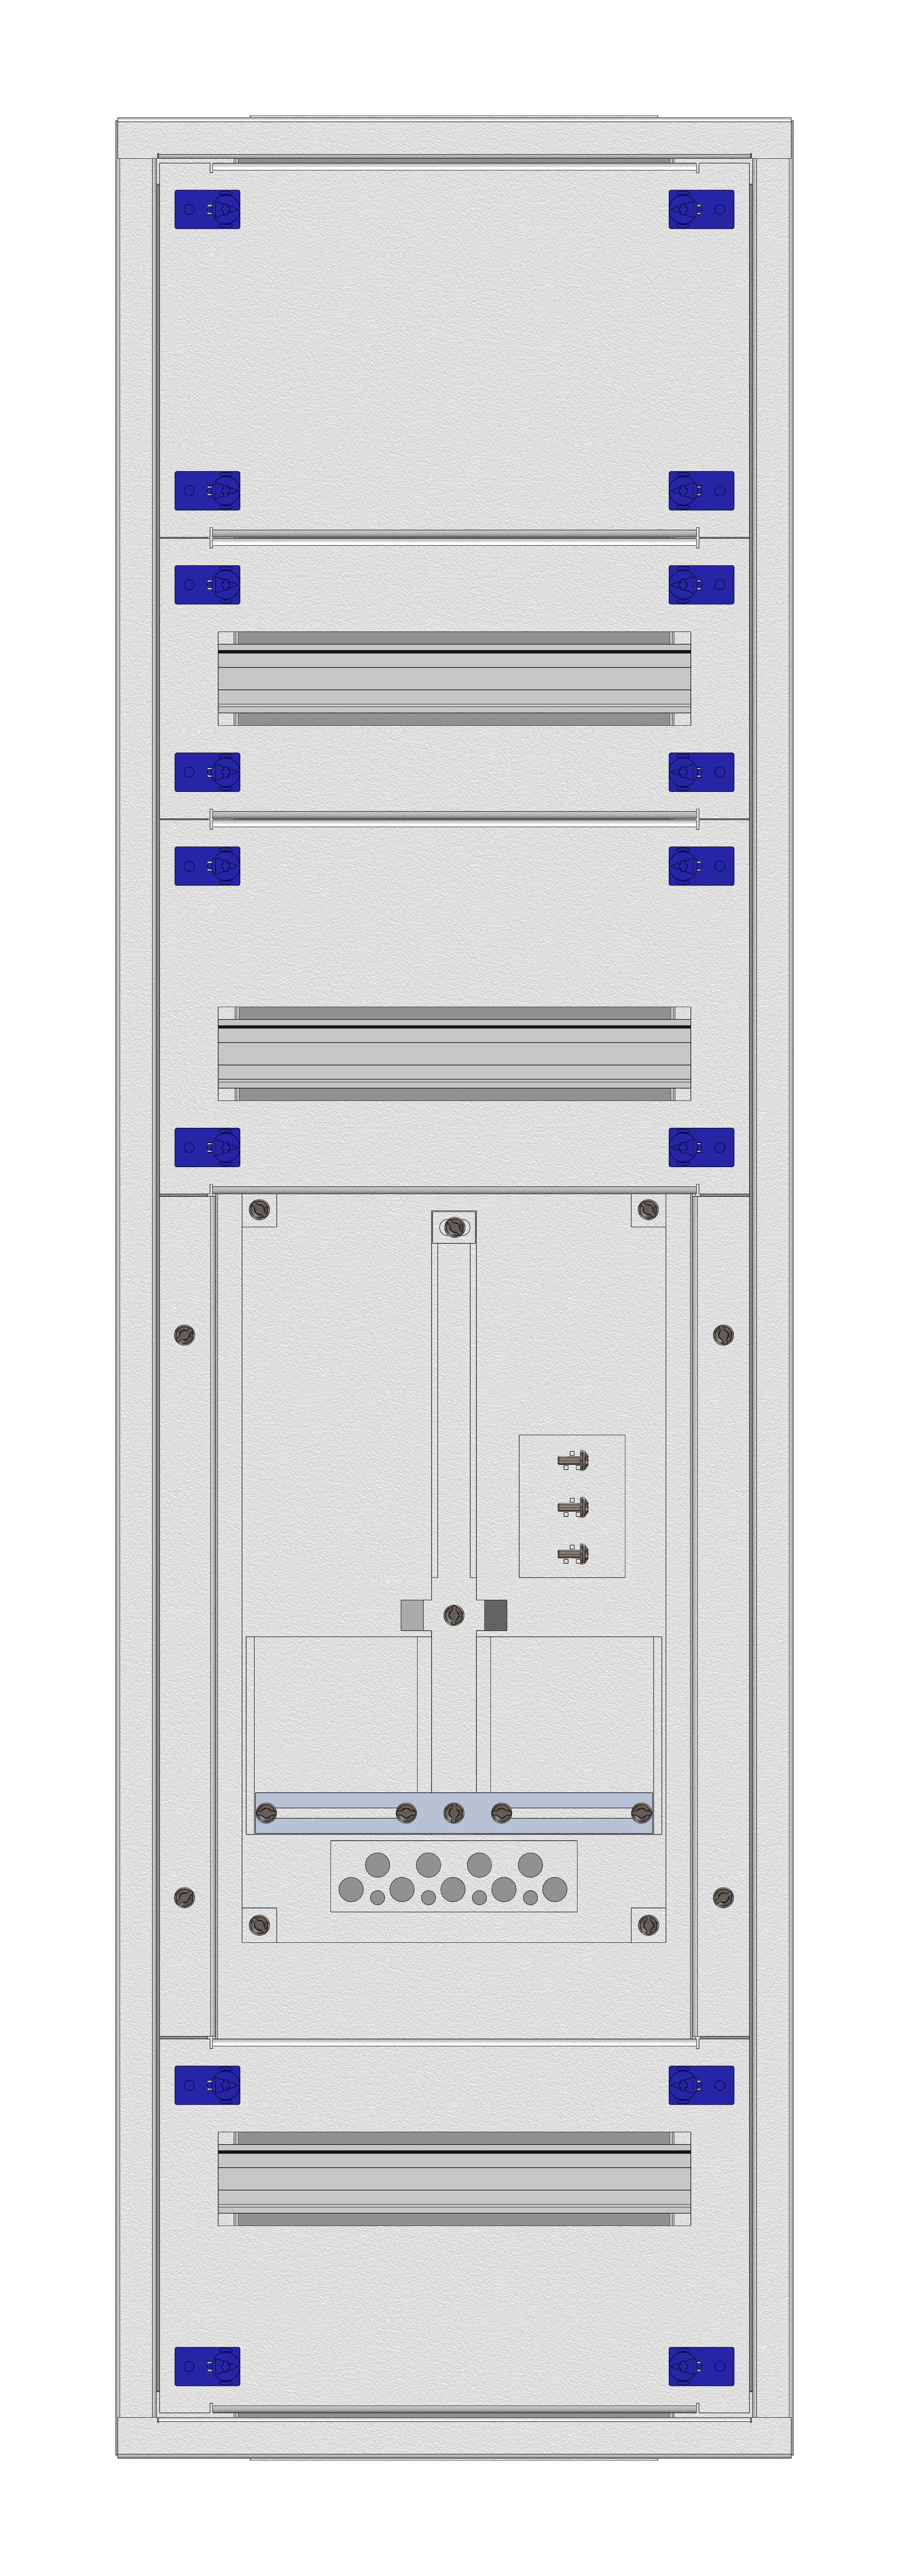 1 Stk Aufputz-Zählerverteiler 1A-24E/VBG 1ZP, H1195B380T250mm IL160124VS